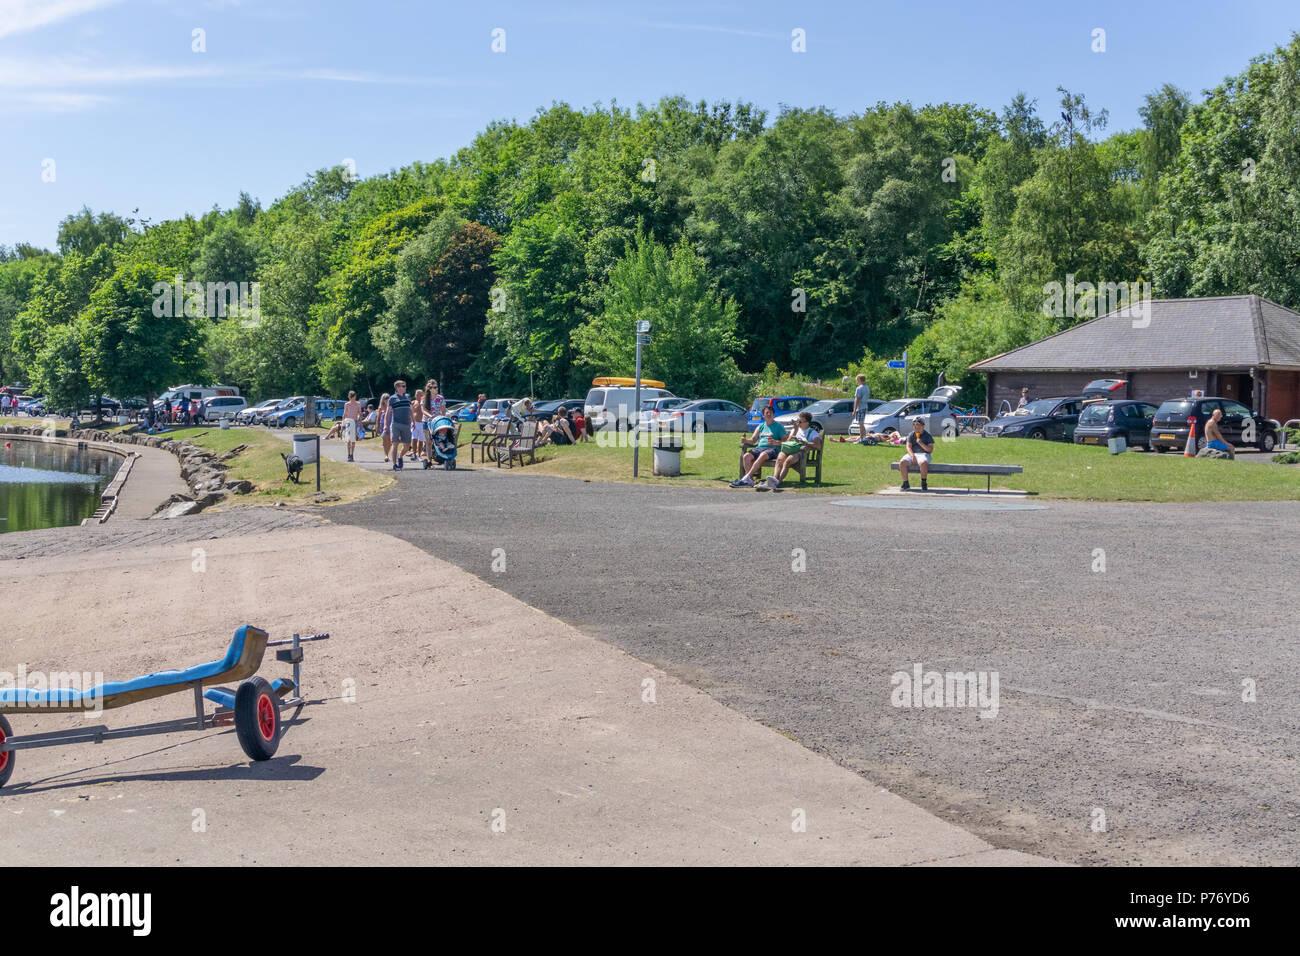 Lochwinnoch, Scotland, UK - July 01, 2018:  Visitors taking advantage of Scotlands unusual heatwave at Castle Semple outdoor centre at Lochwinnoch. - Stock Image